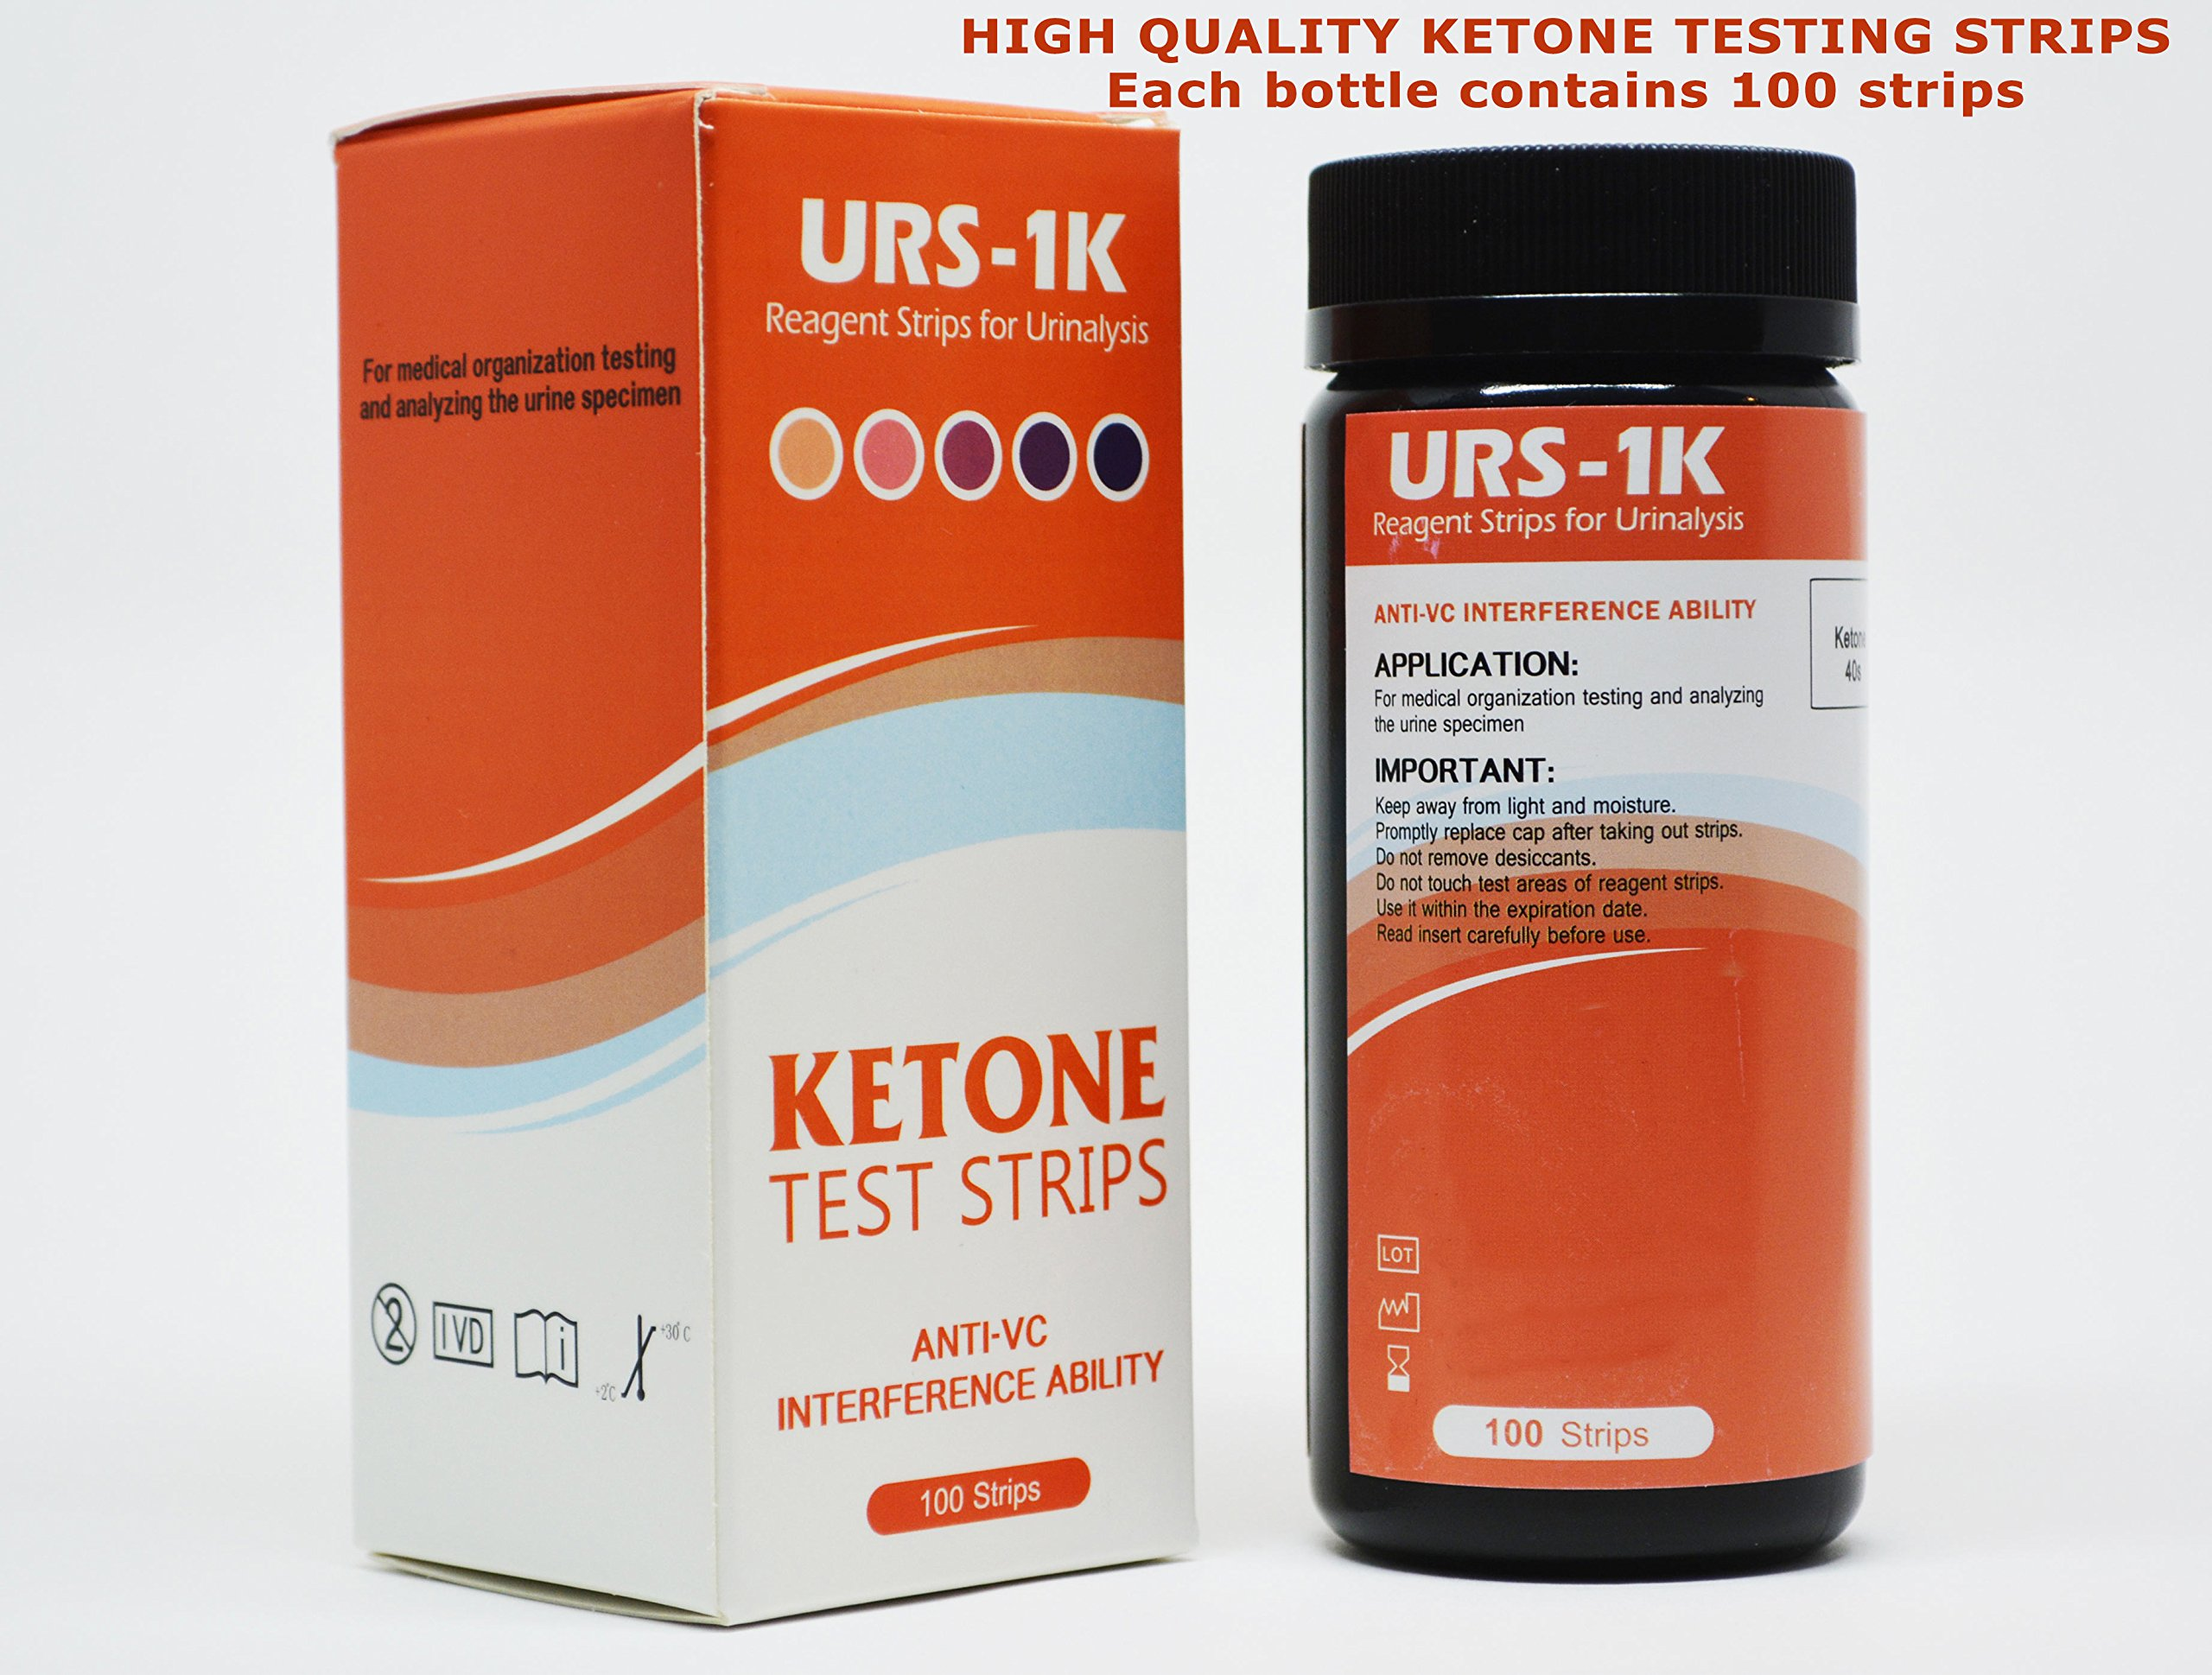 400 PACK (4 BOTTLE) of Ketone Test Strips - Professional Grade - Ketogenic, Paleo, Atkins Diets